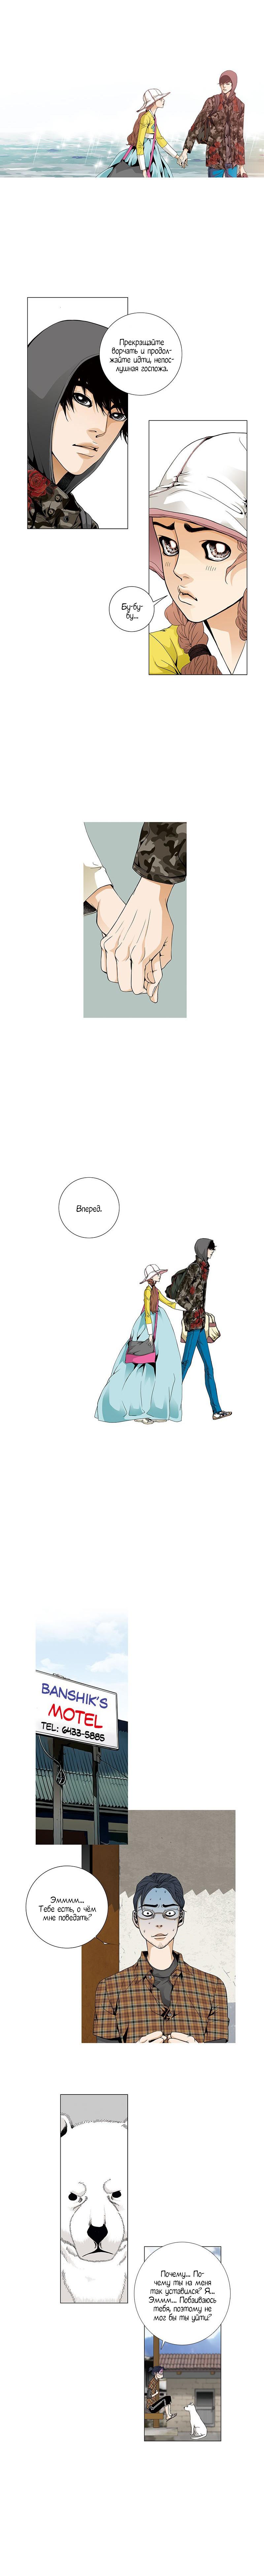 https://r1.ninemanga.com/comics/pic2/29/28573/344322/1512078364968.jpg Page 3